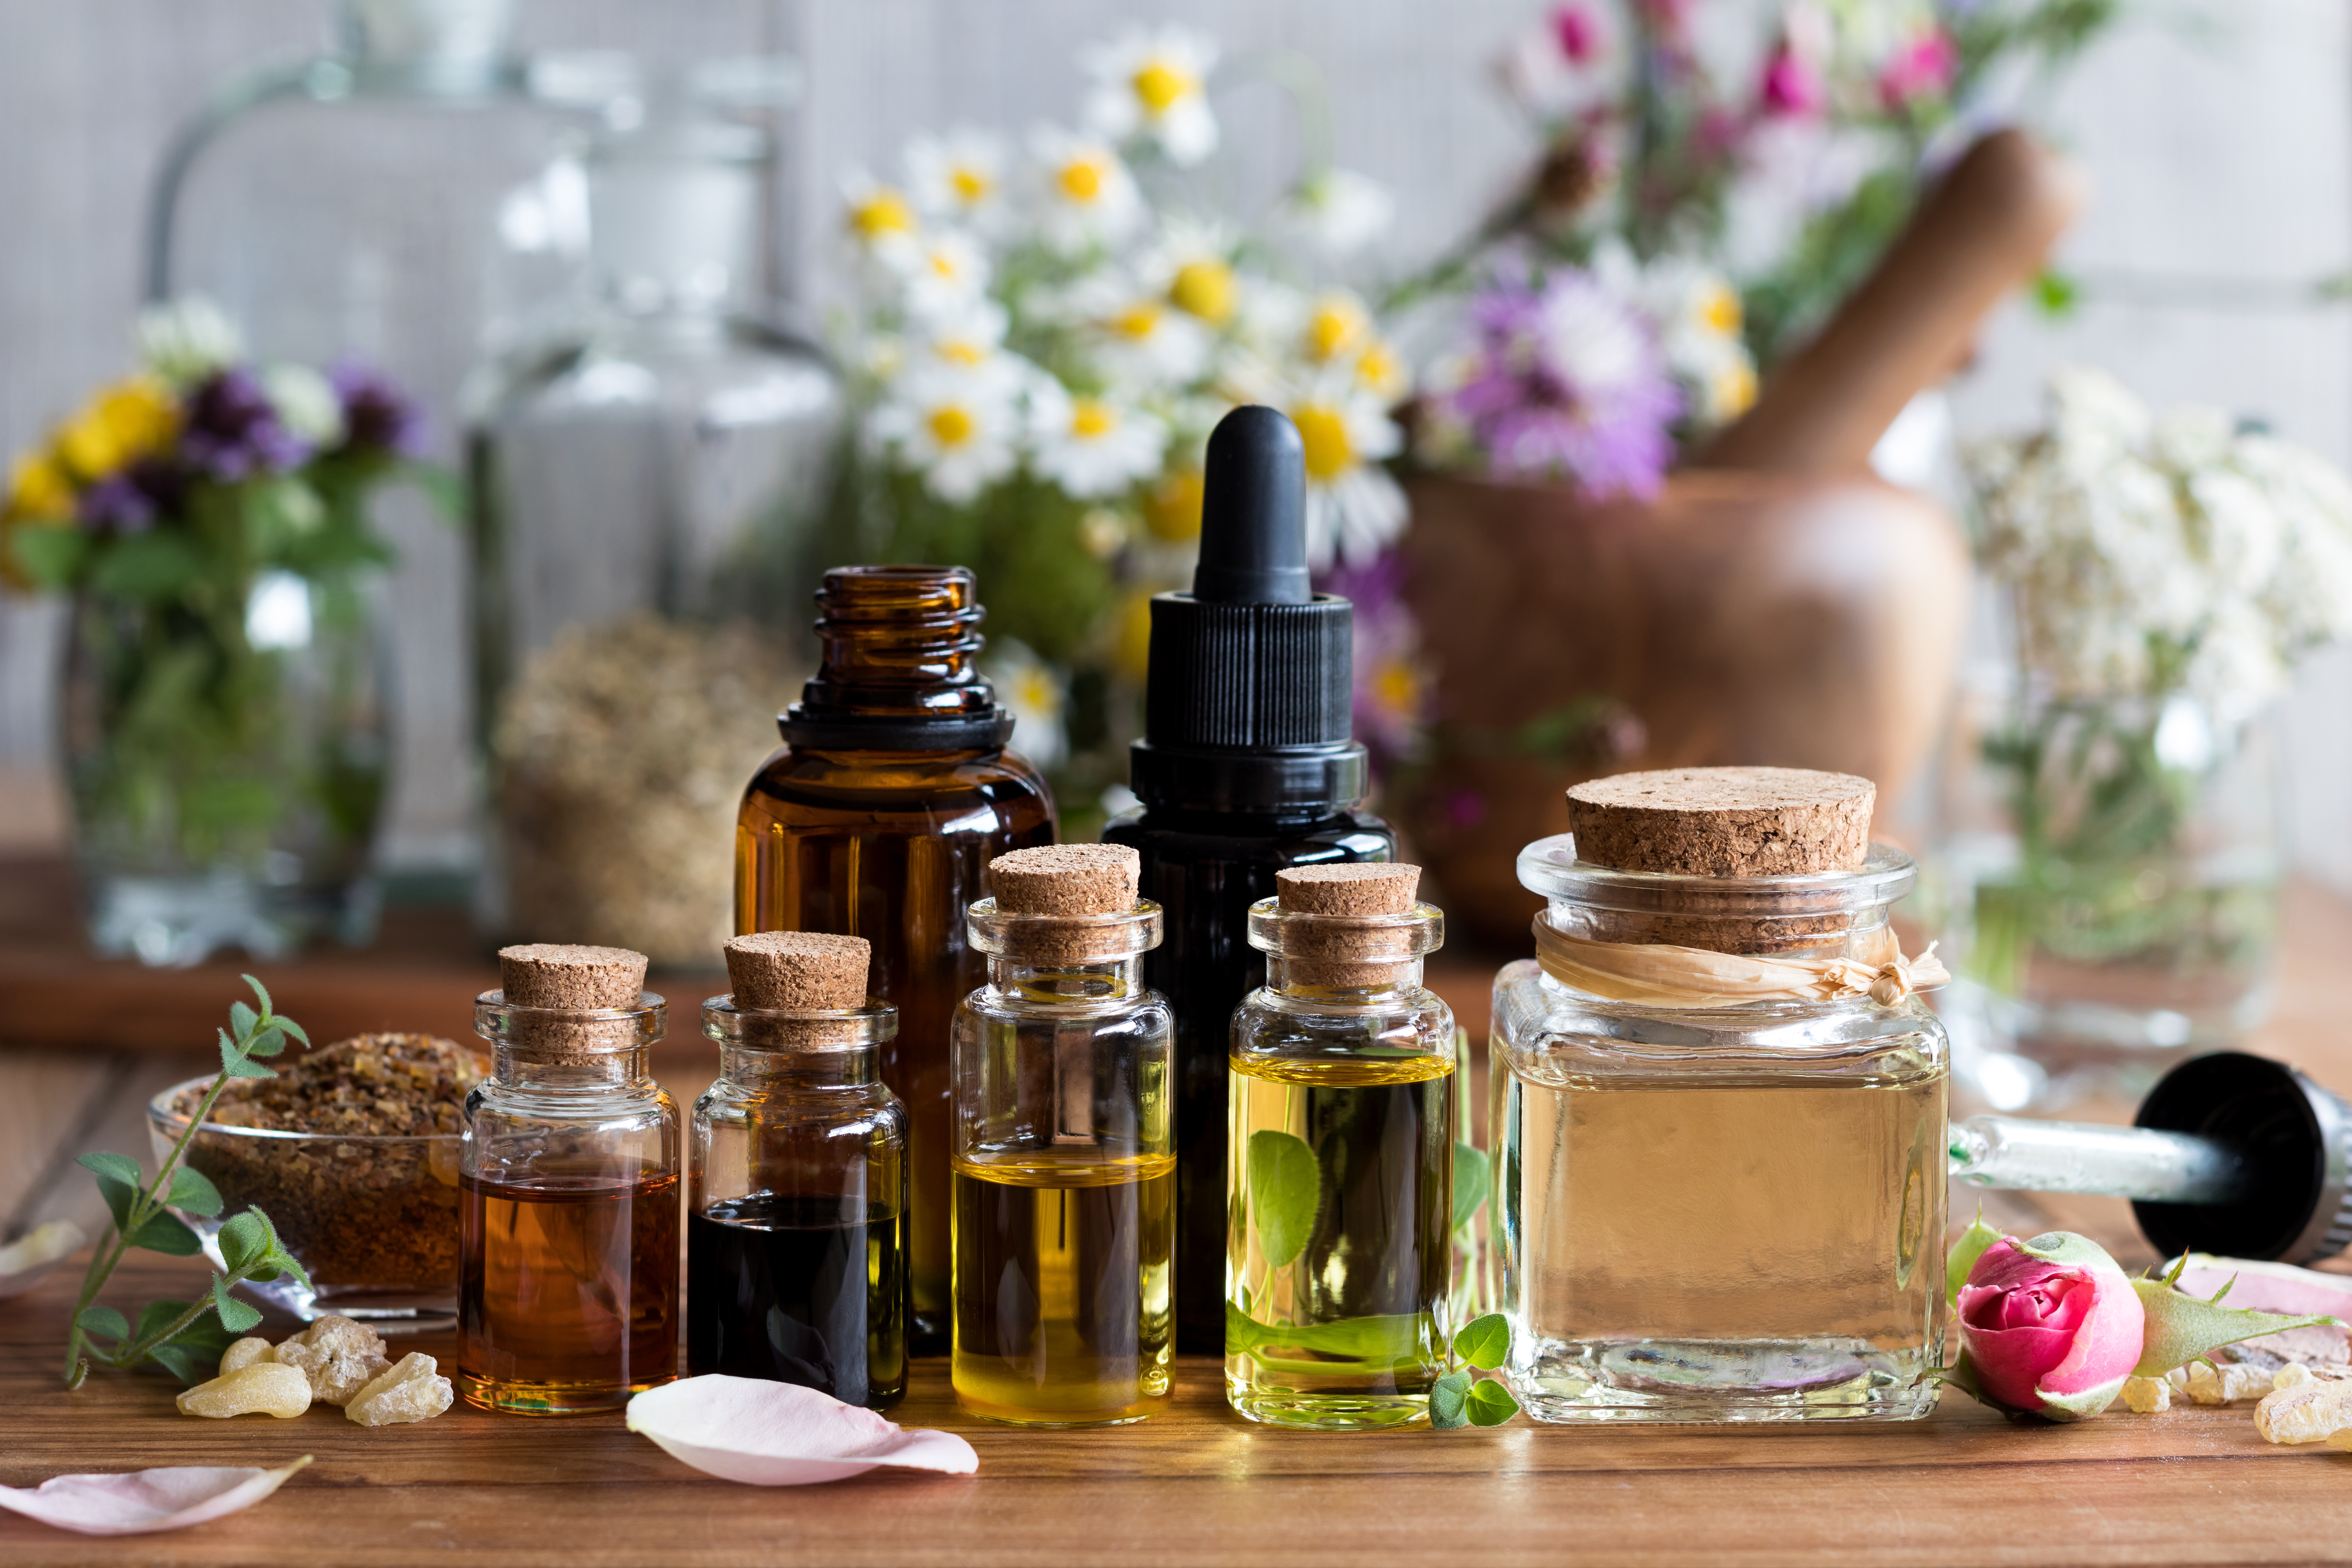 Glowing Skin Care Oils